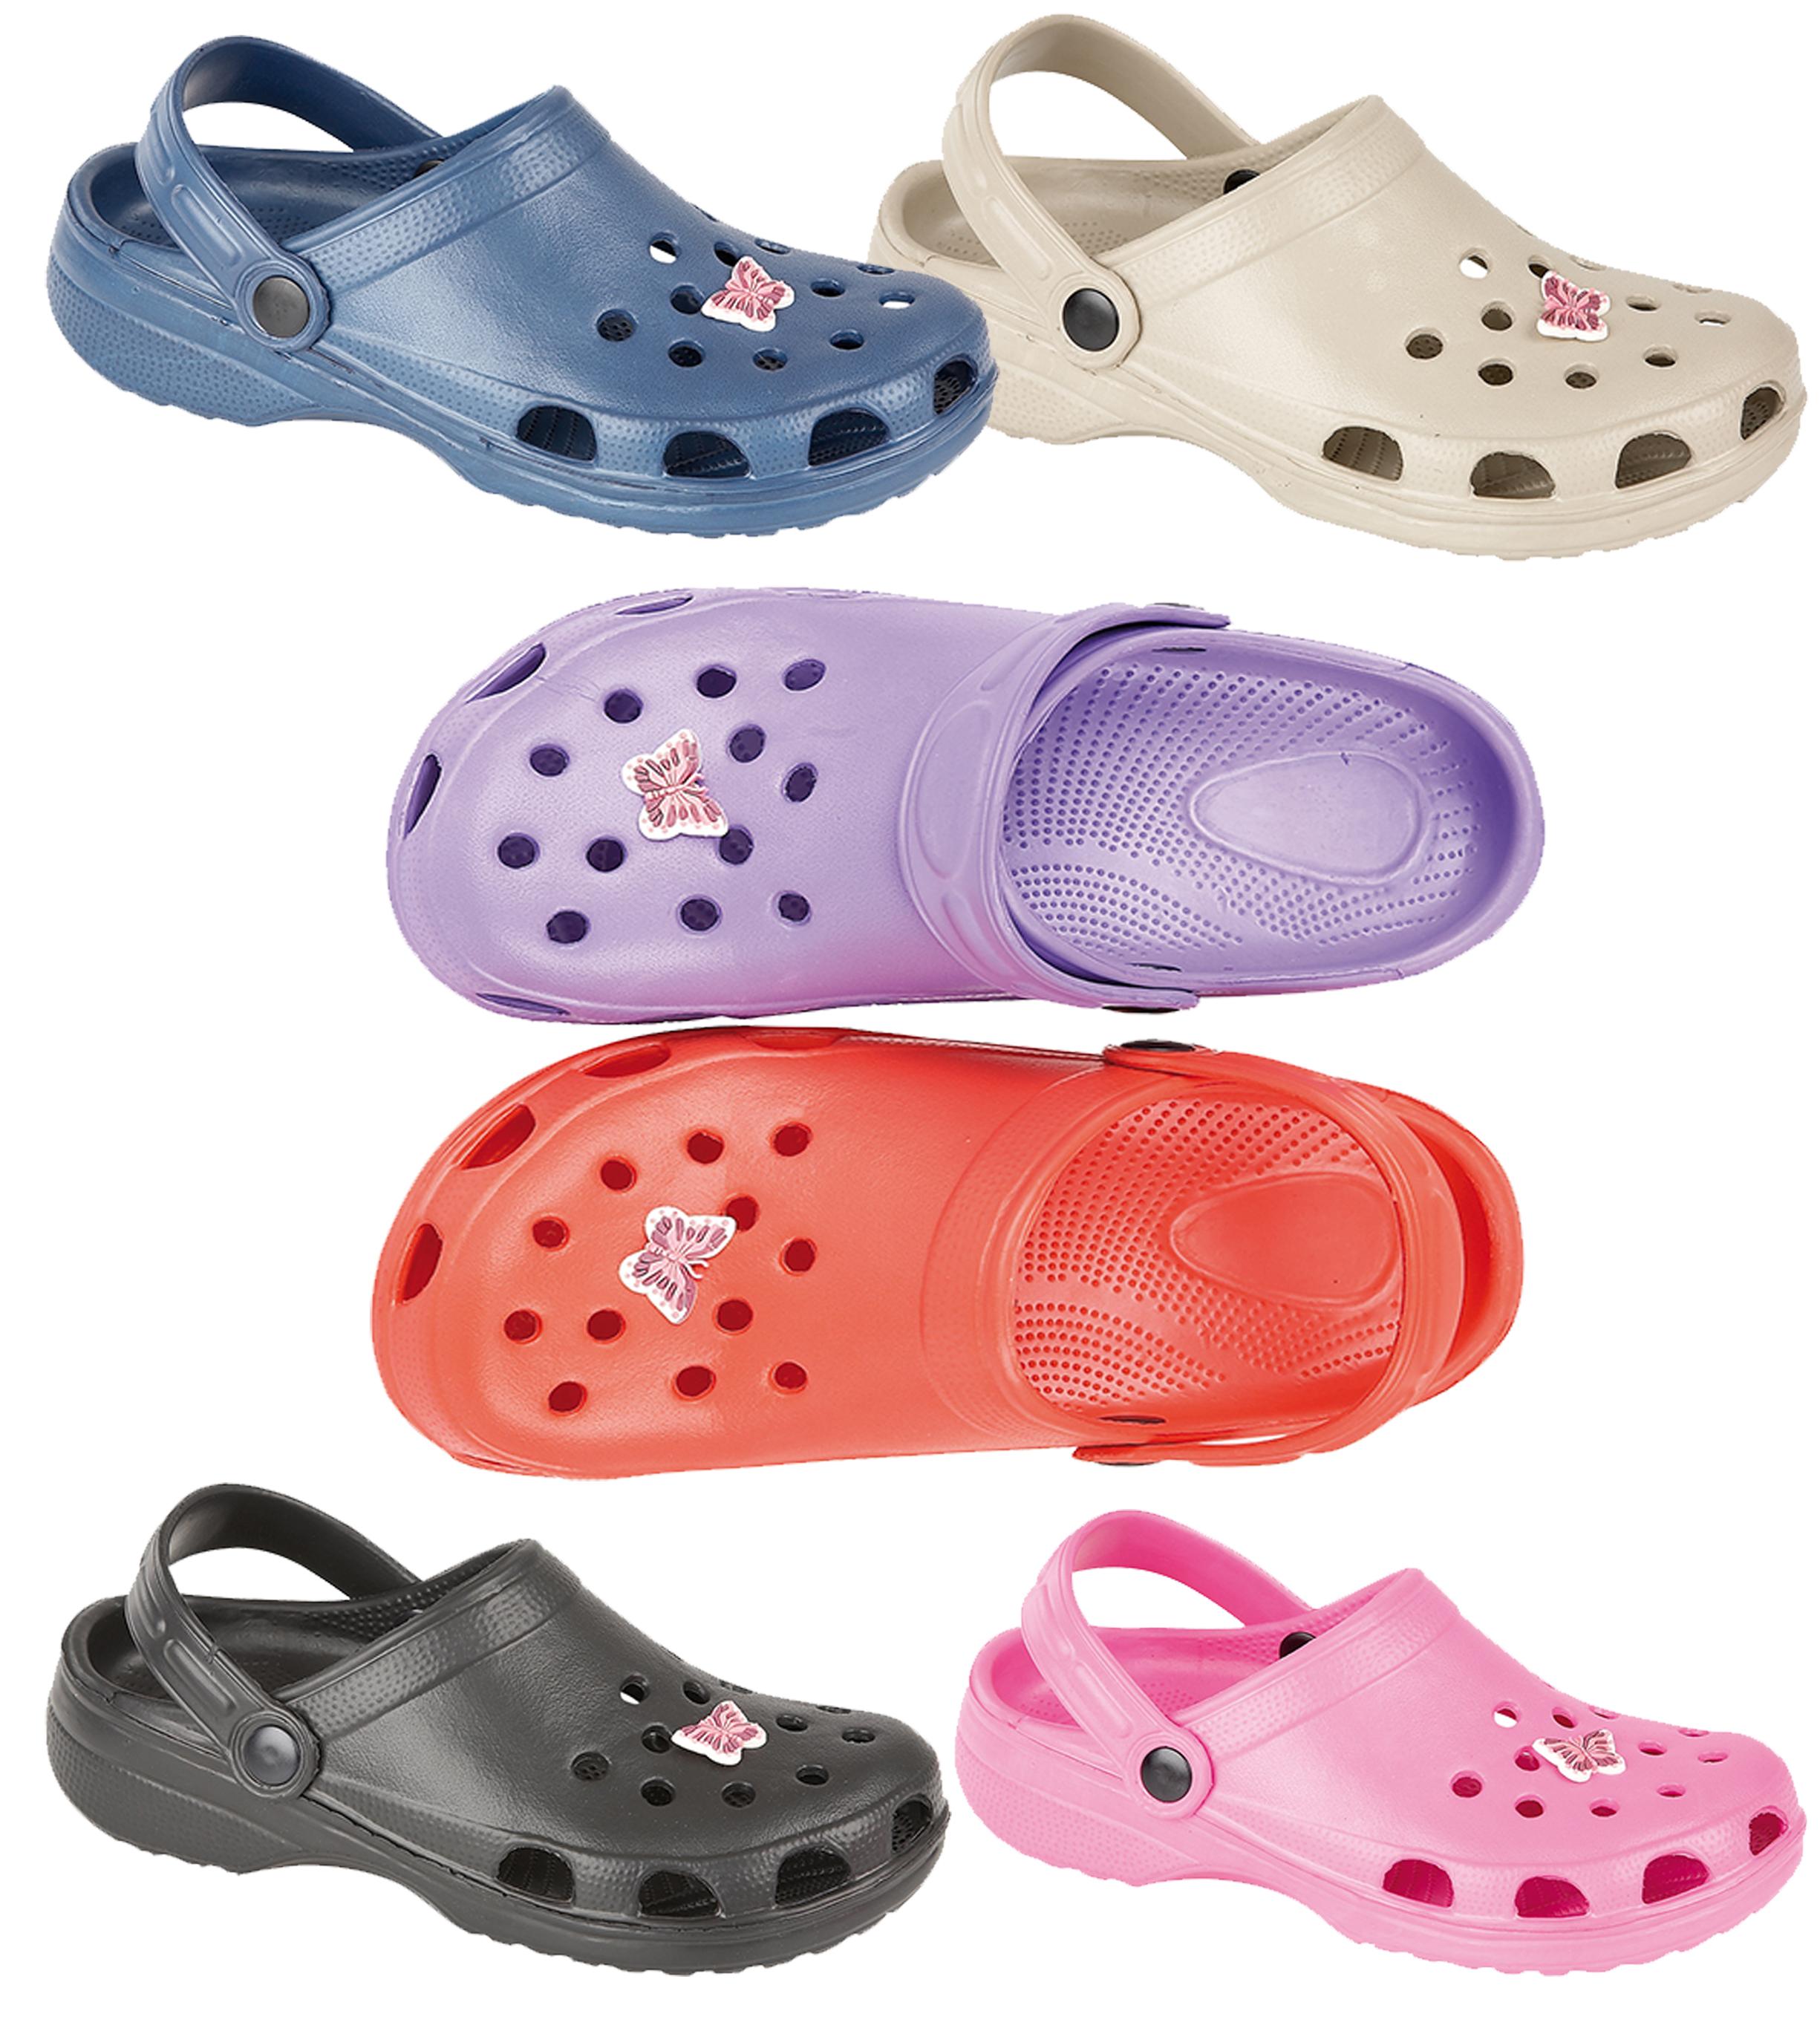 Shoes sandals flip flops - Image2